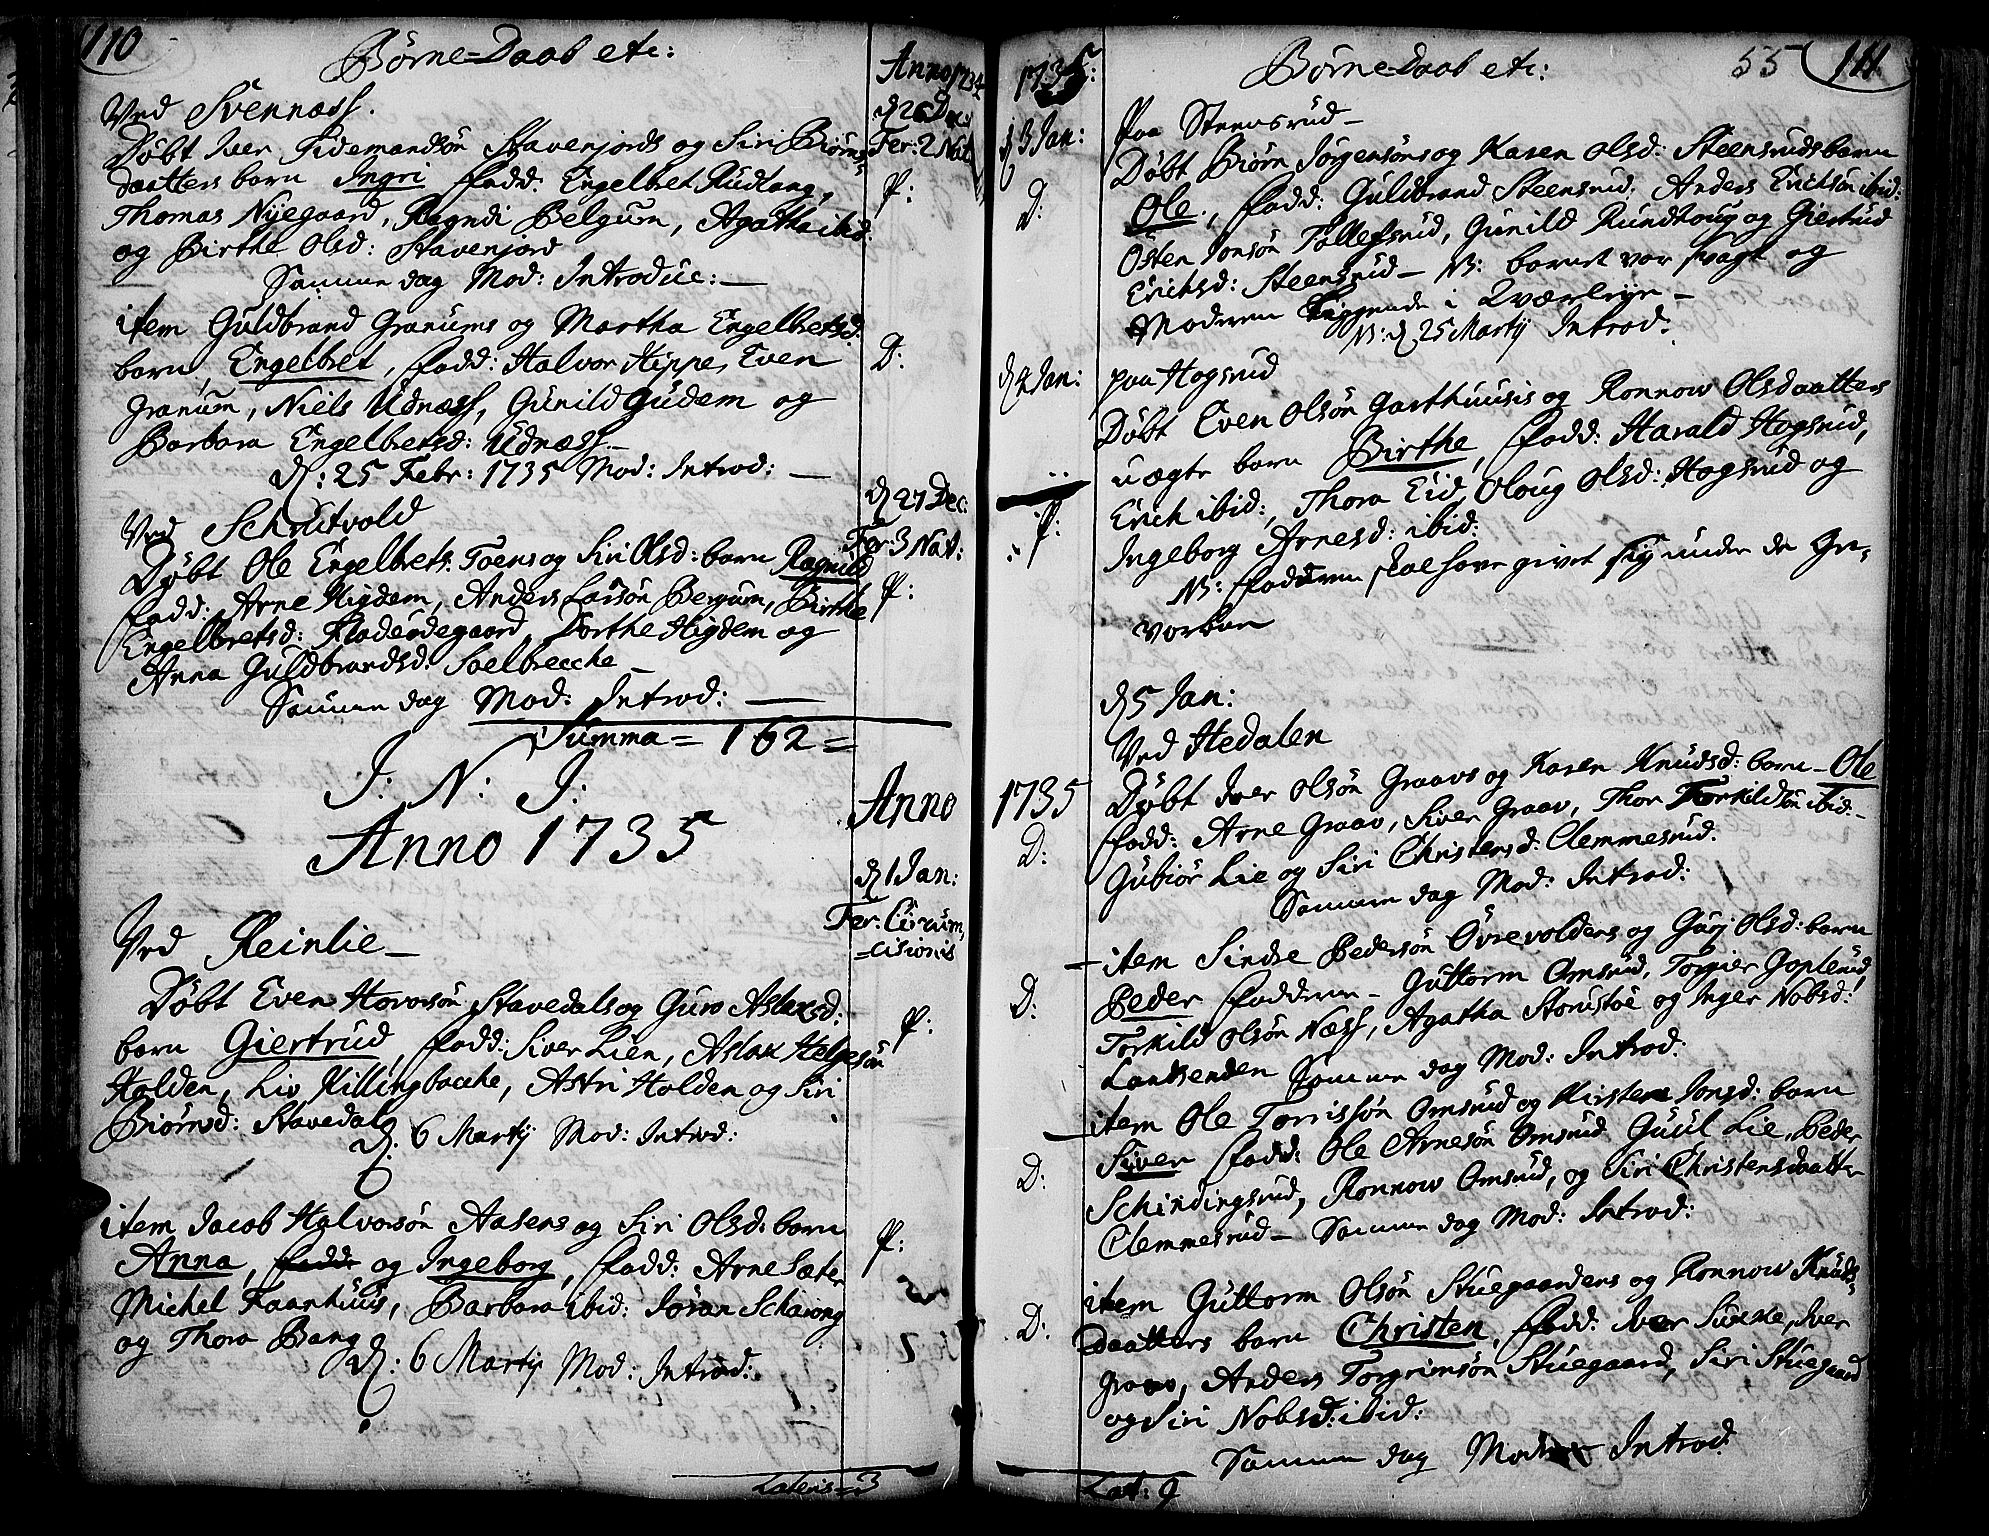 SAH, Aurdal prestekontor, Ministerialbok nr. 4, 1730-1762, s. 110-111